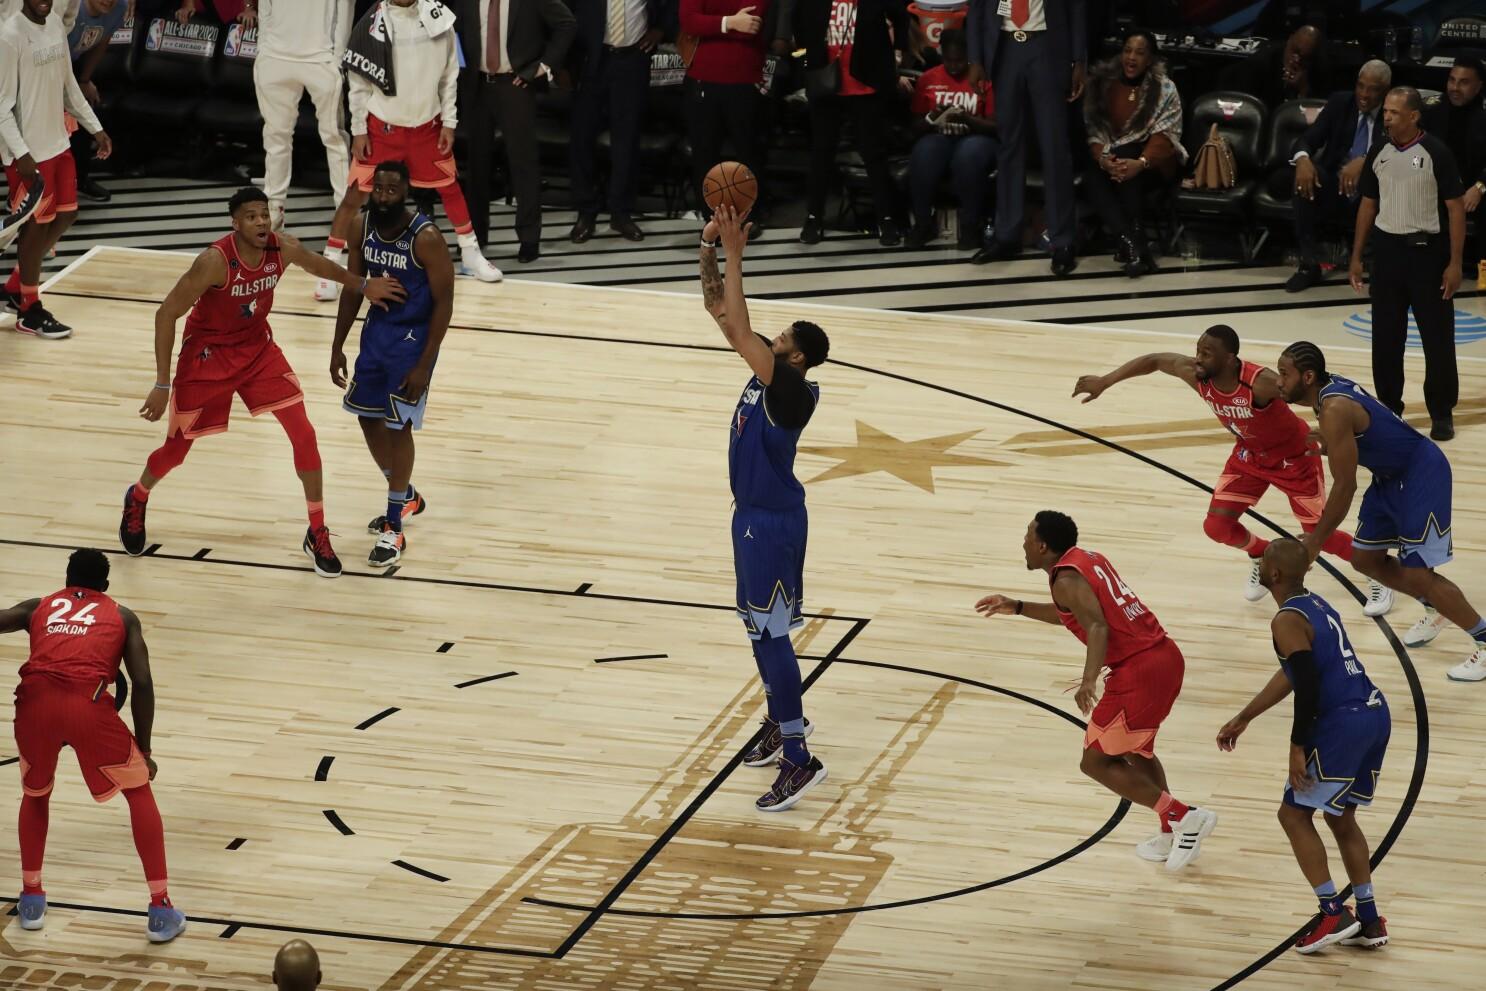 NBA將推出HORSE投籃比賽!多位知名球員將參加,電視也將會進行直播!